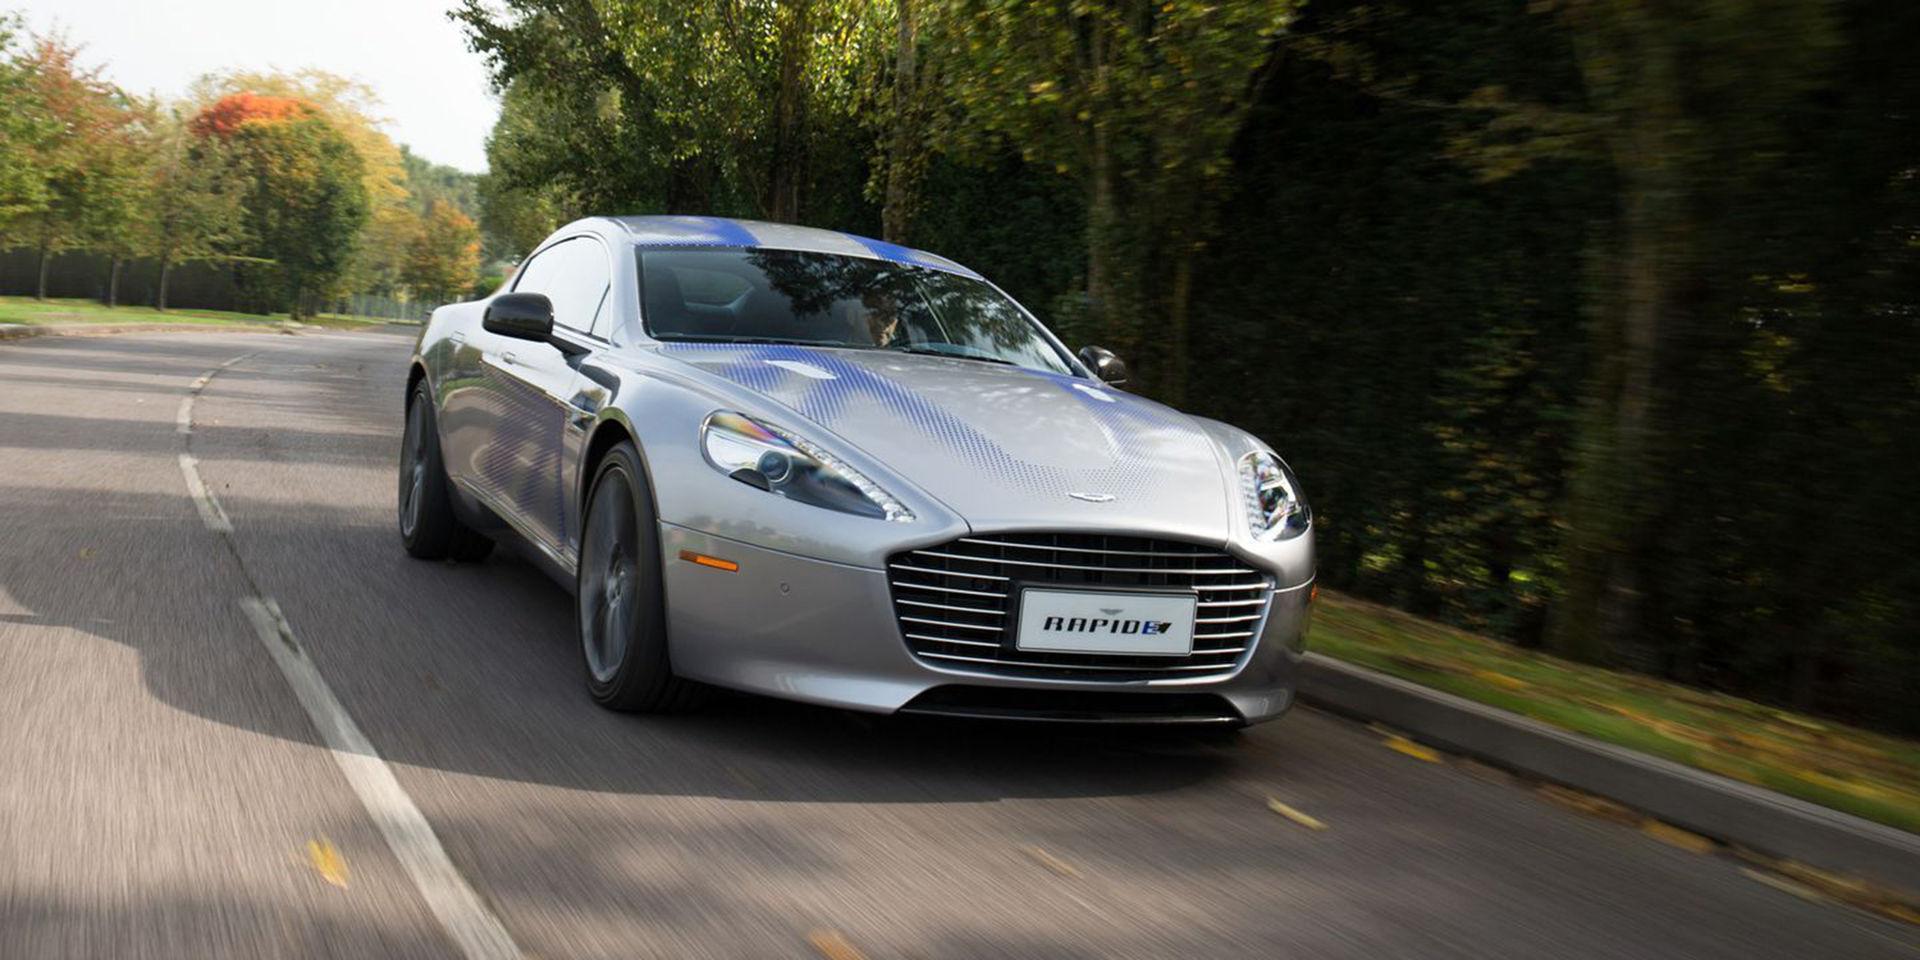 Nya Bond-bilen blir Aston Martin Rapide E